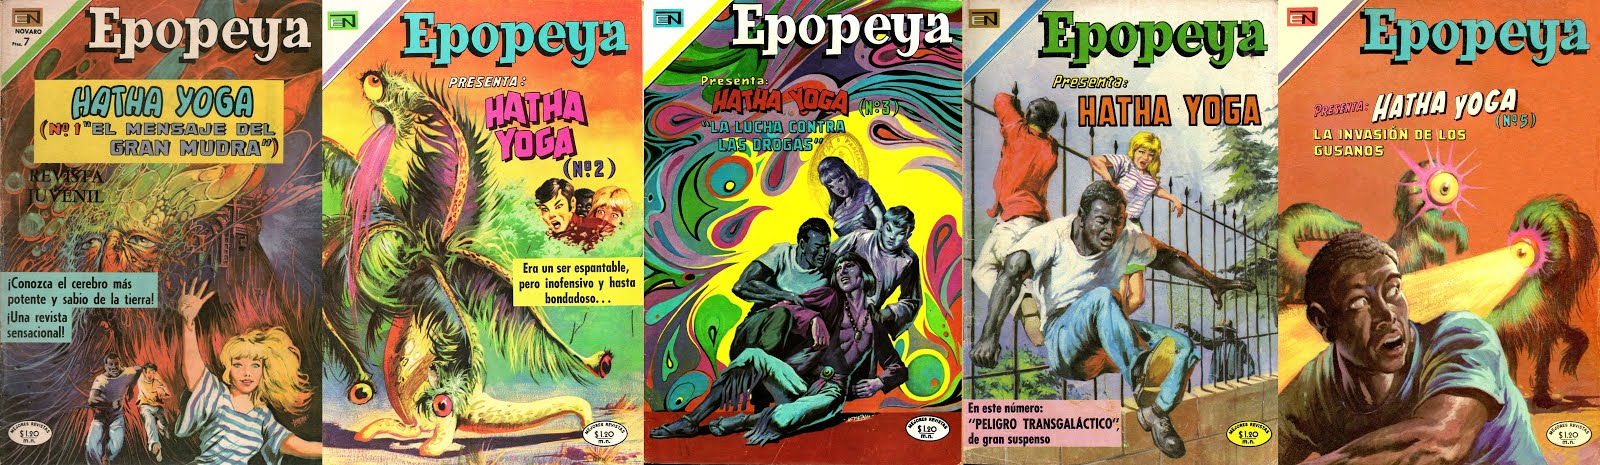 Hatha-Yoga en Epopeya Novaro - Completo